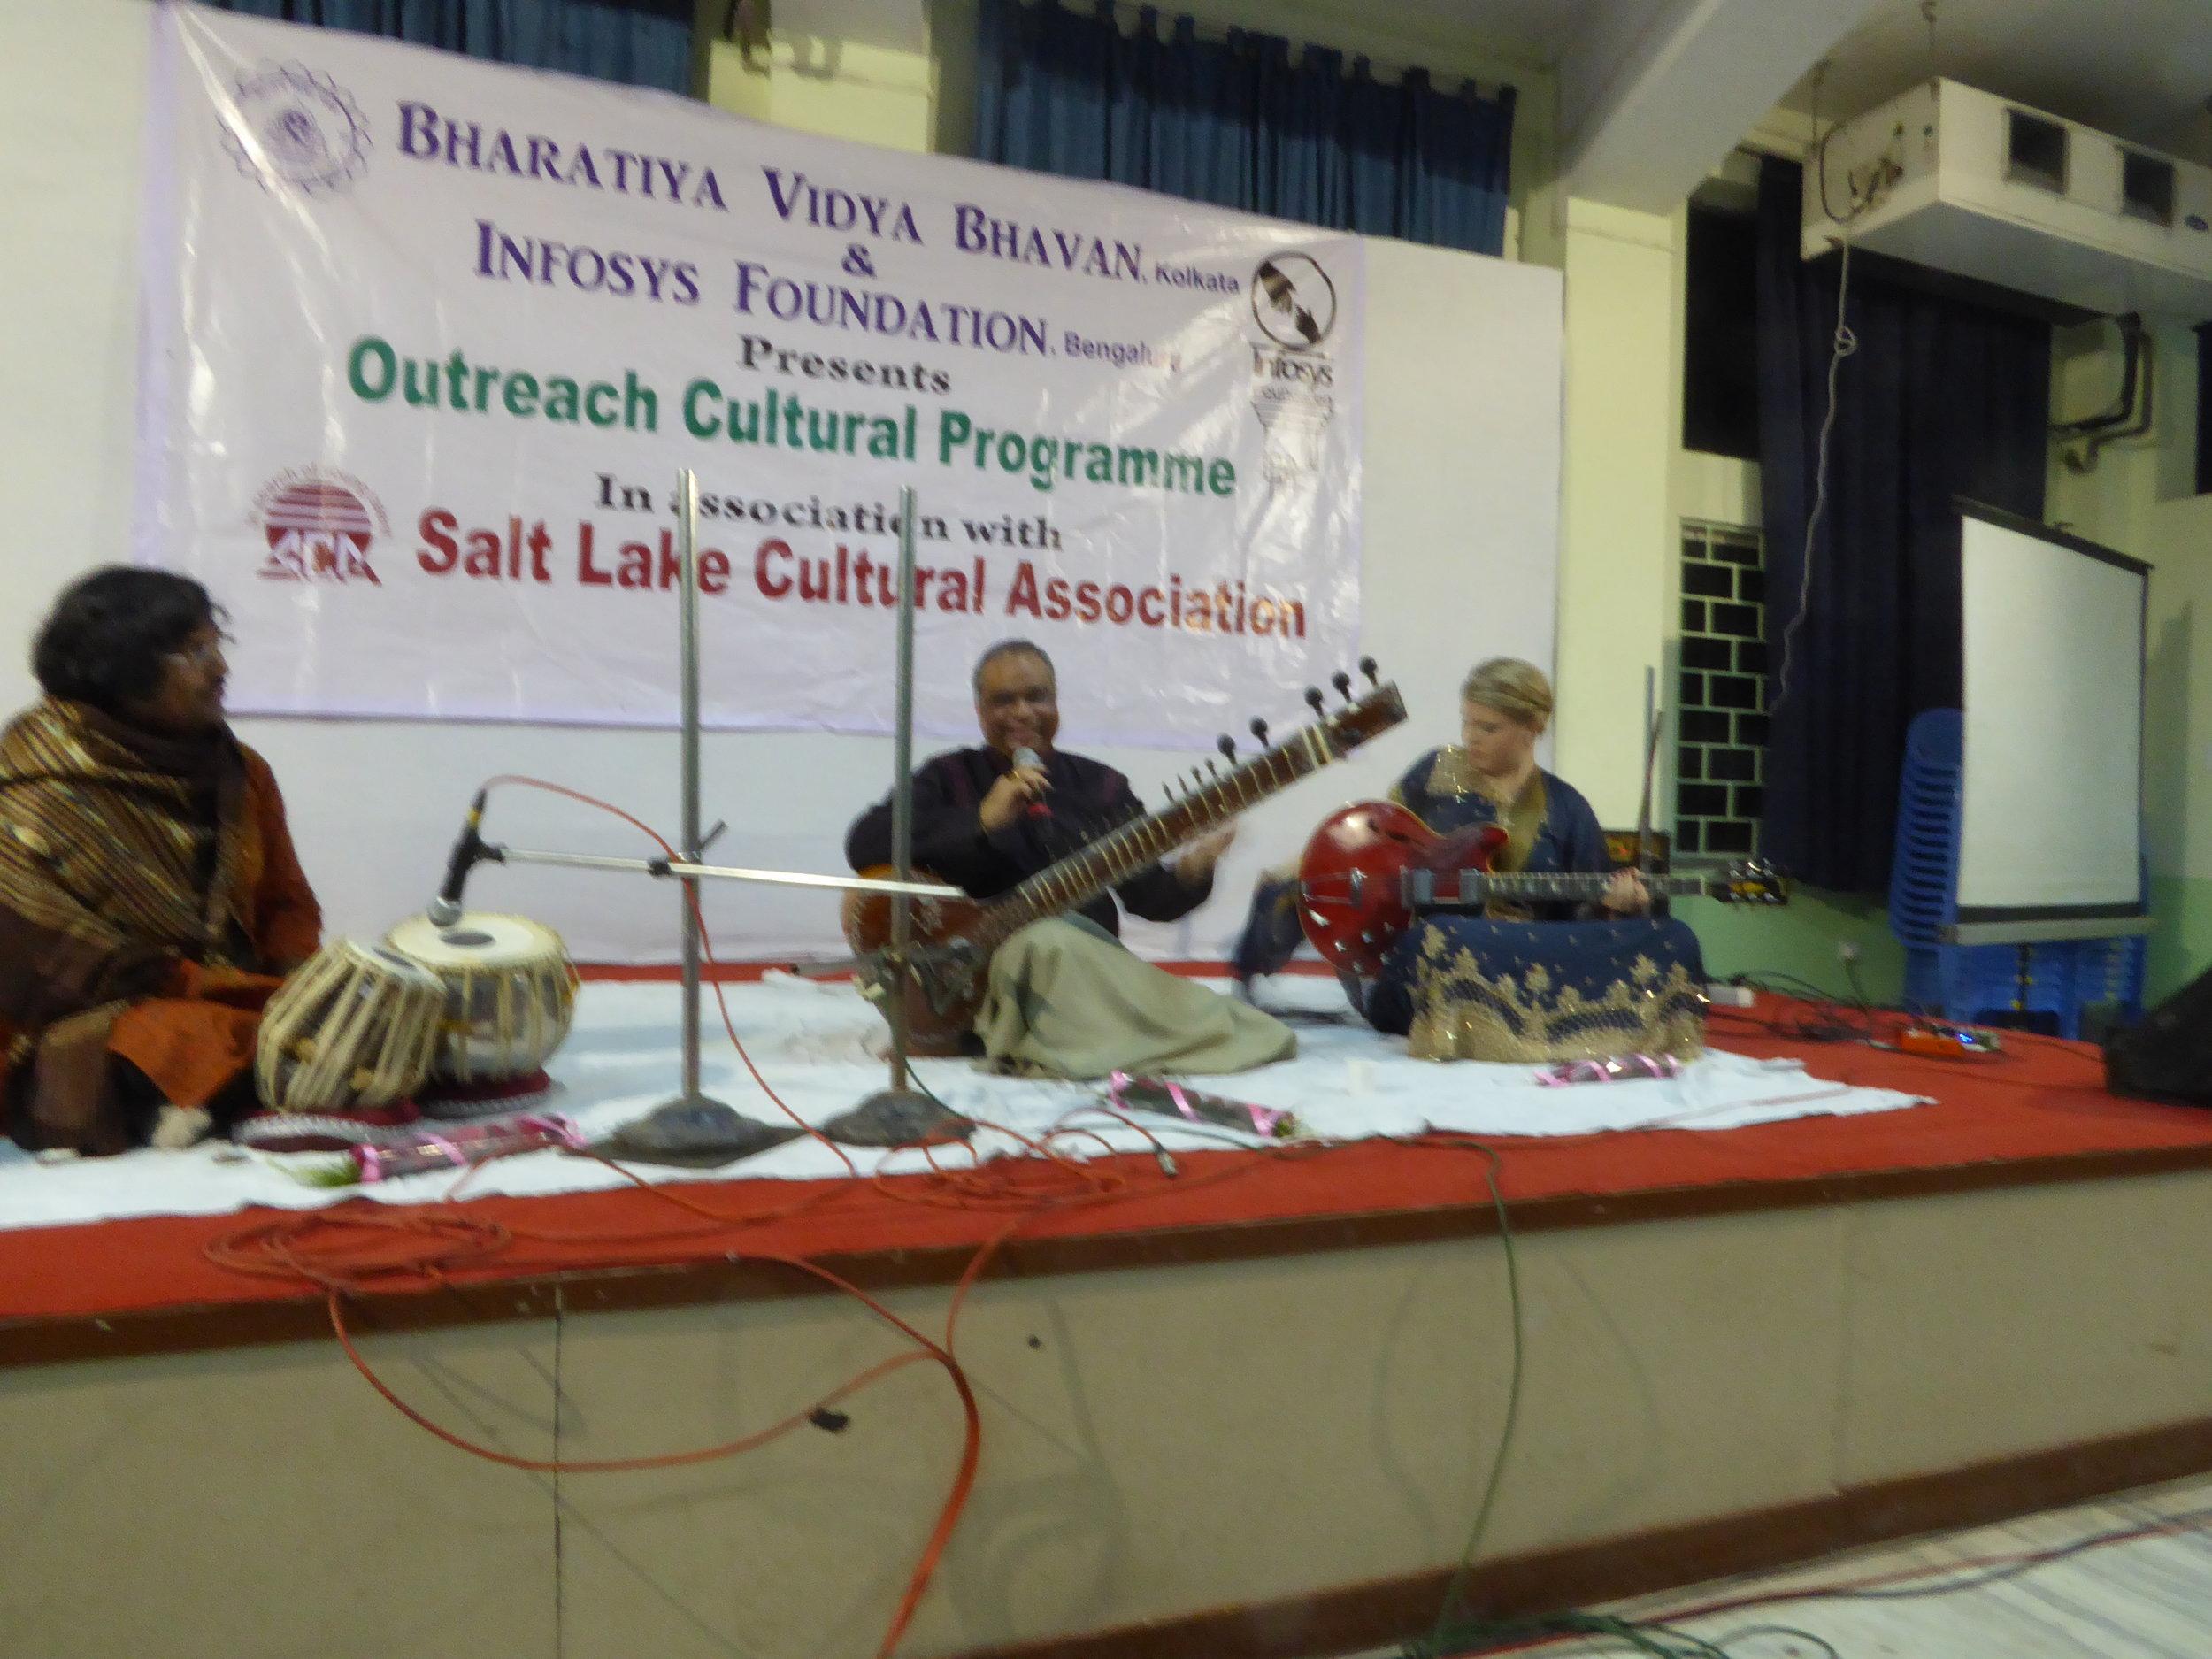 Salt Lake Cultural Association, 3.1.16. Amit Chatterjee on tables